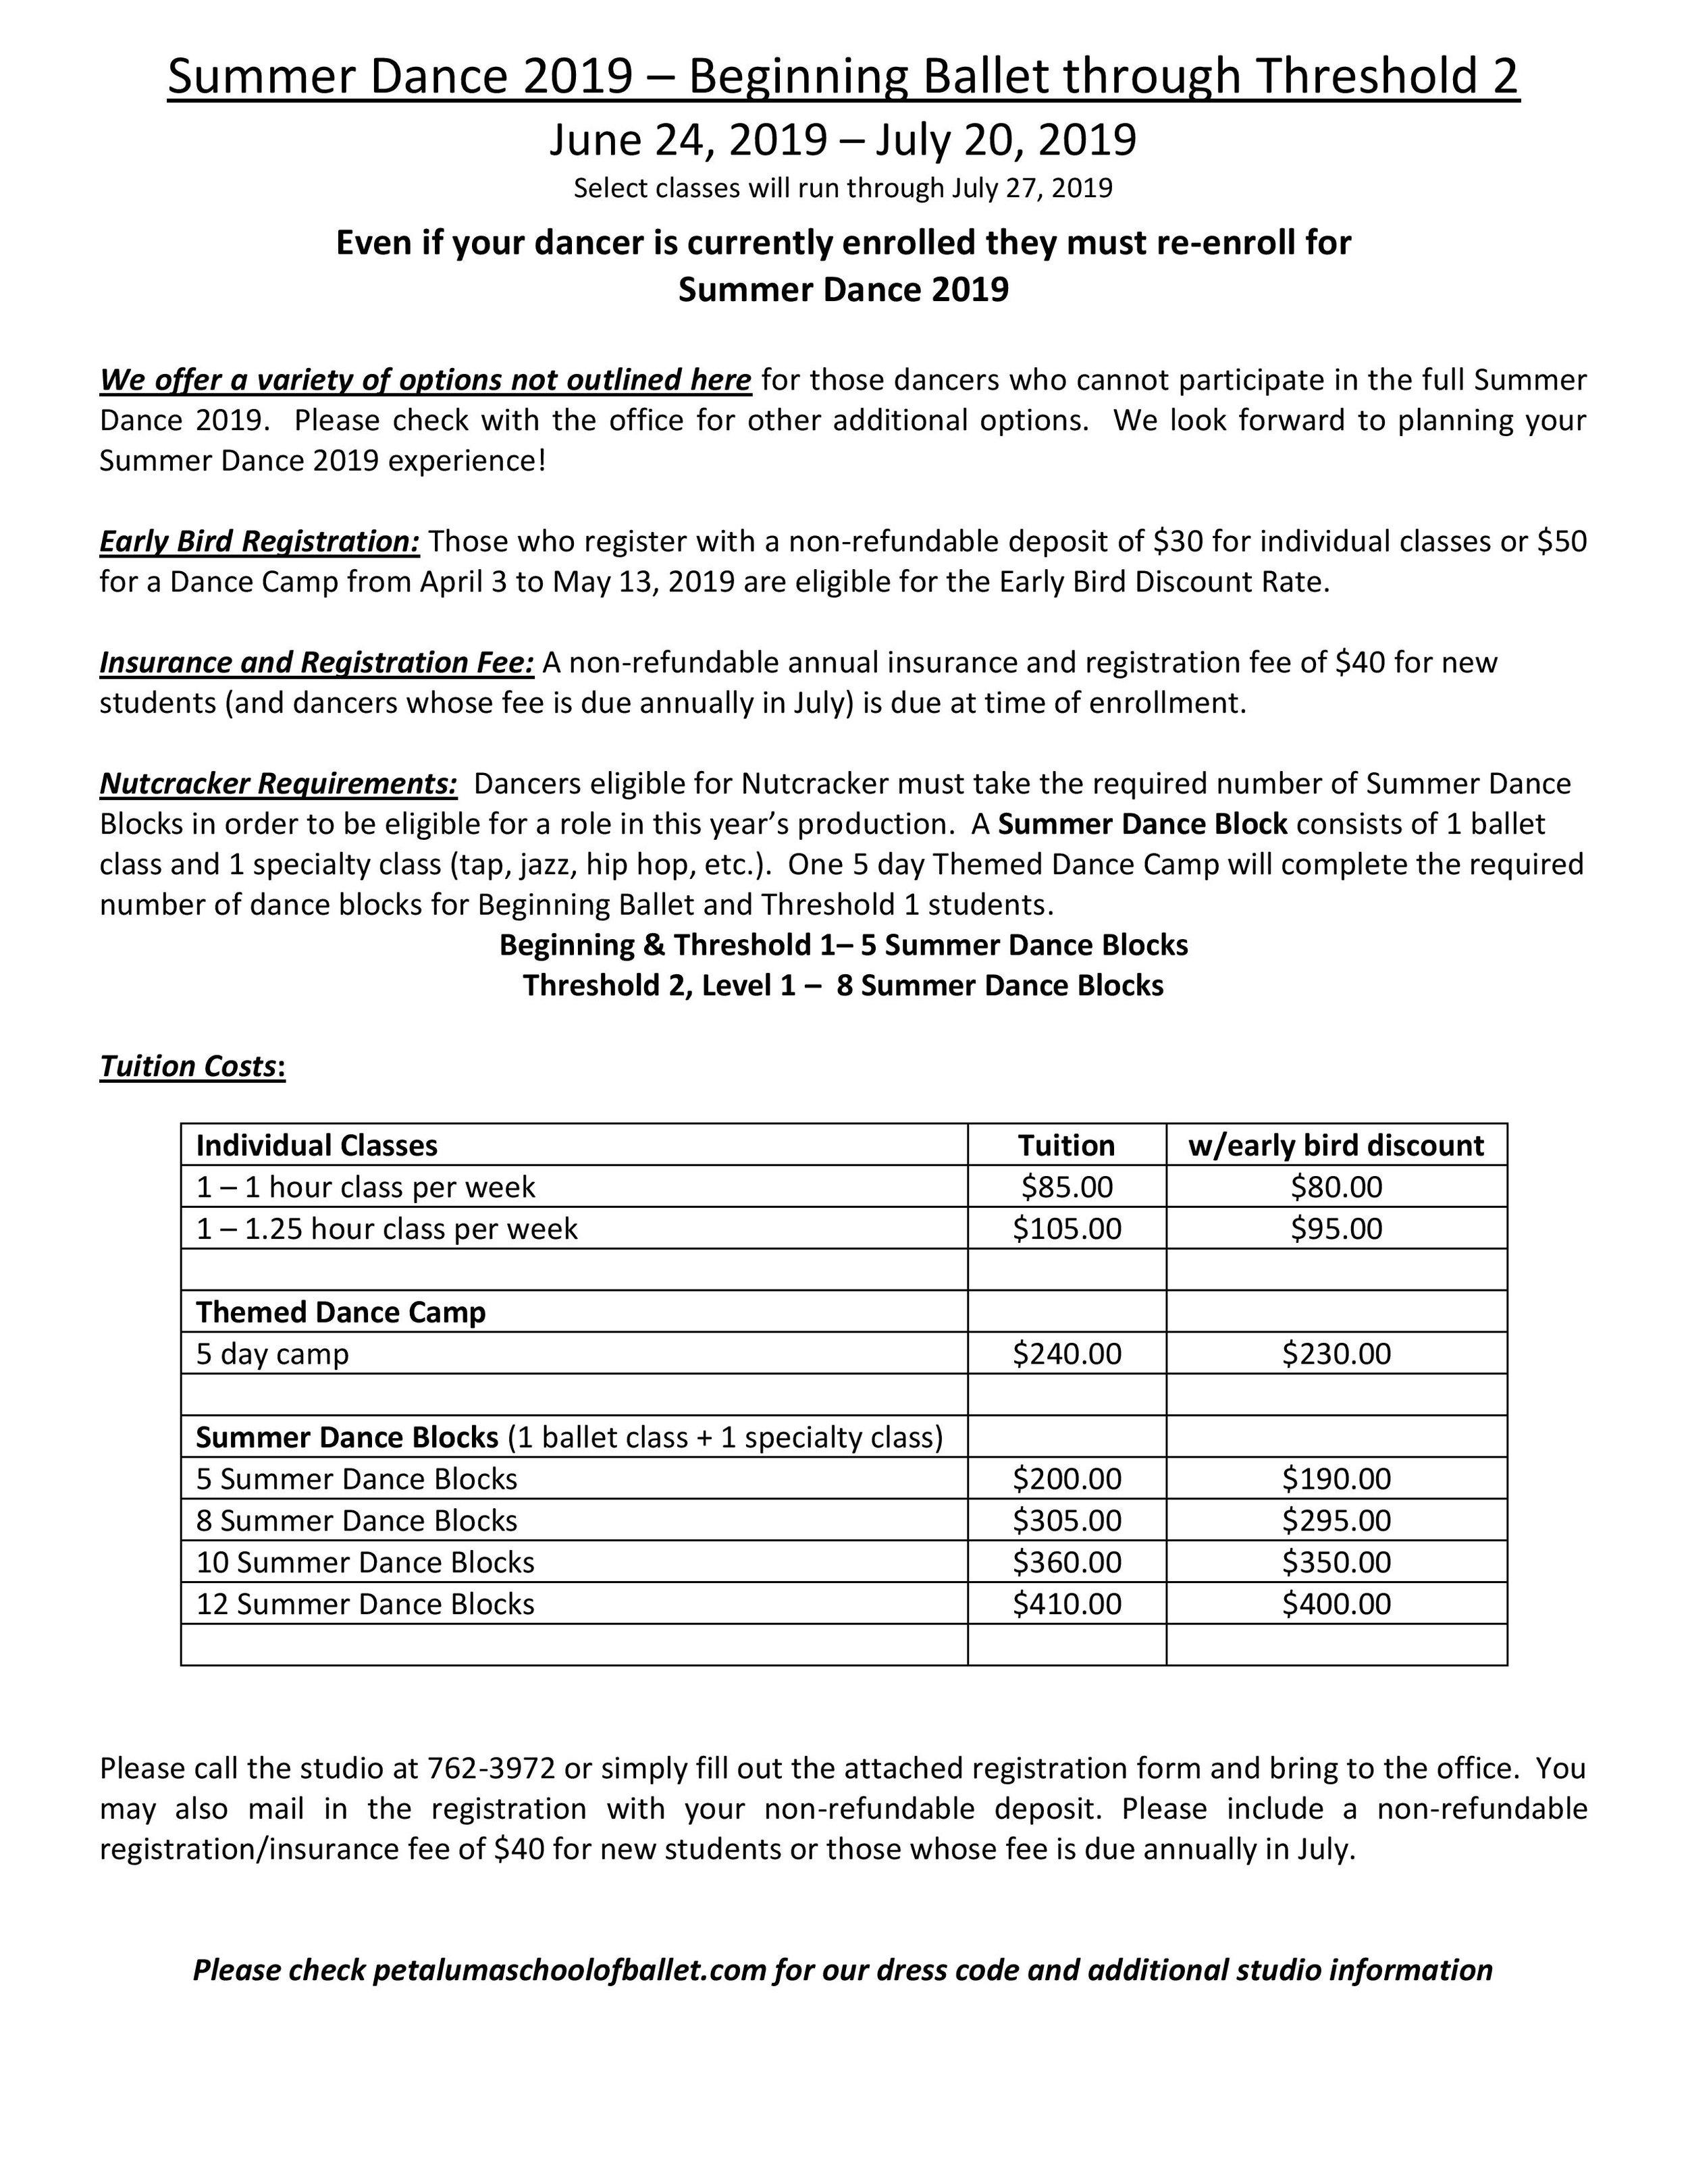 Money beg - thresh 2 2019-page-001.jpg